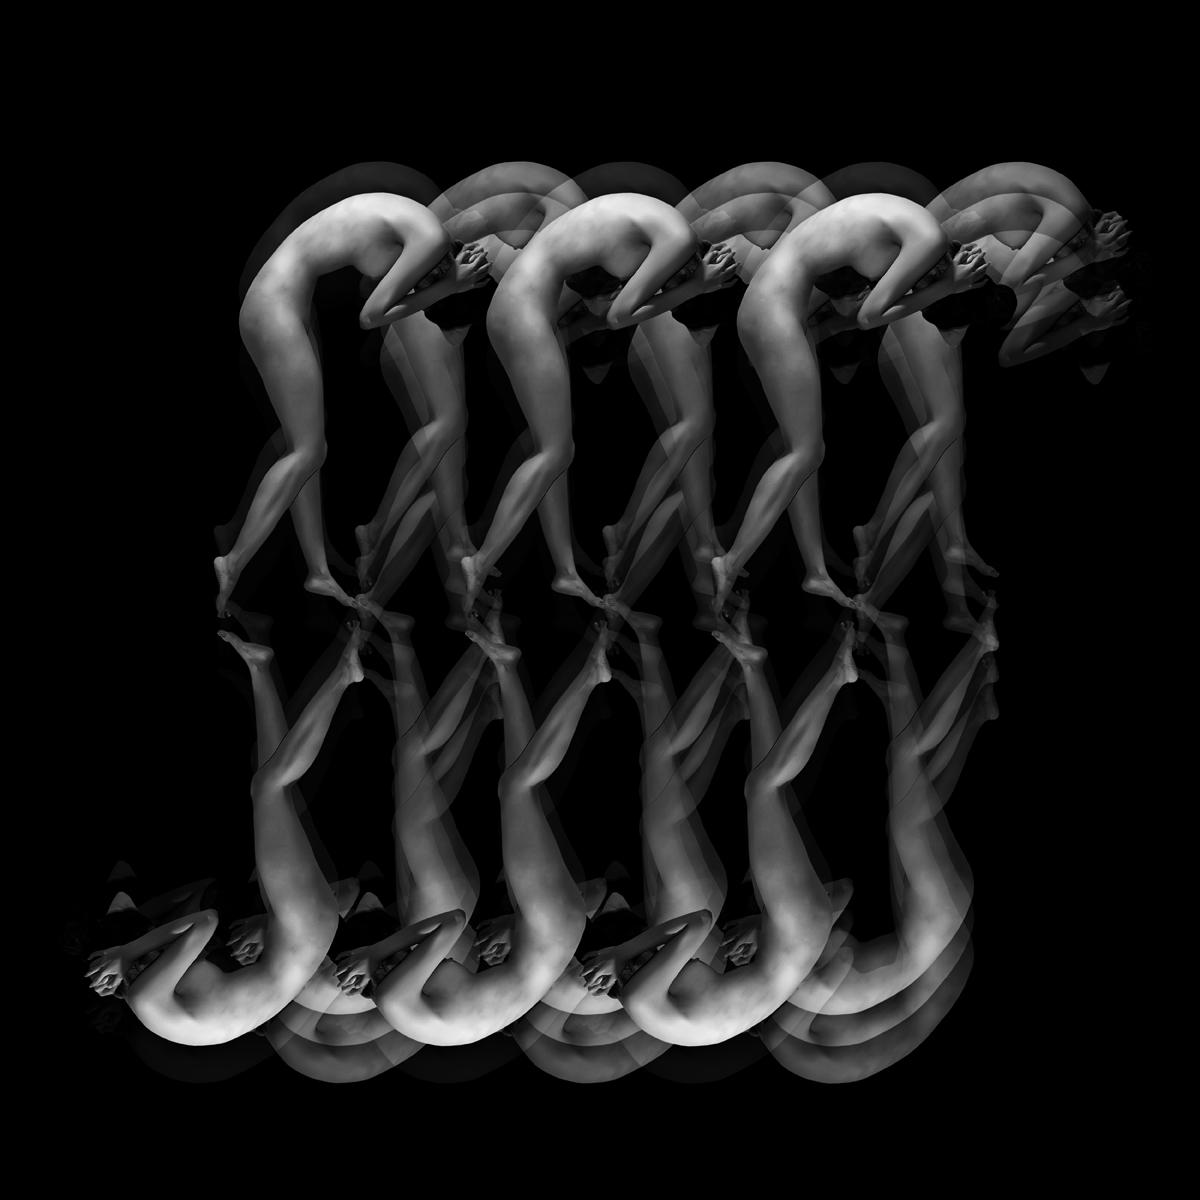 emel-karakozak-budding-nudes-abstract-photographer-05